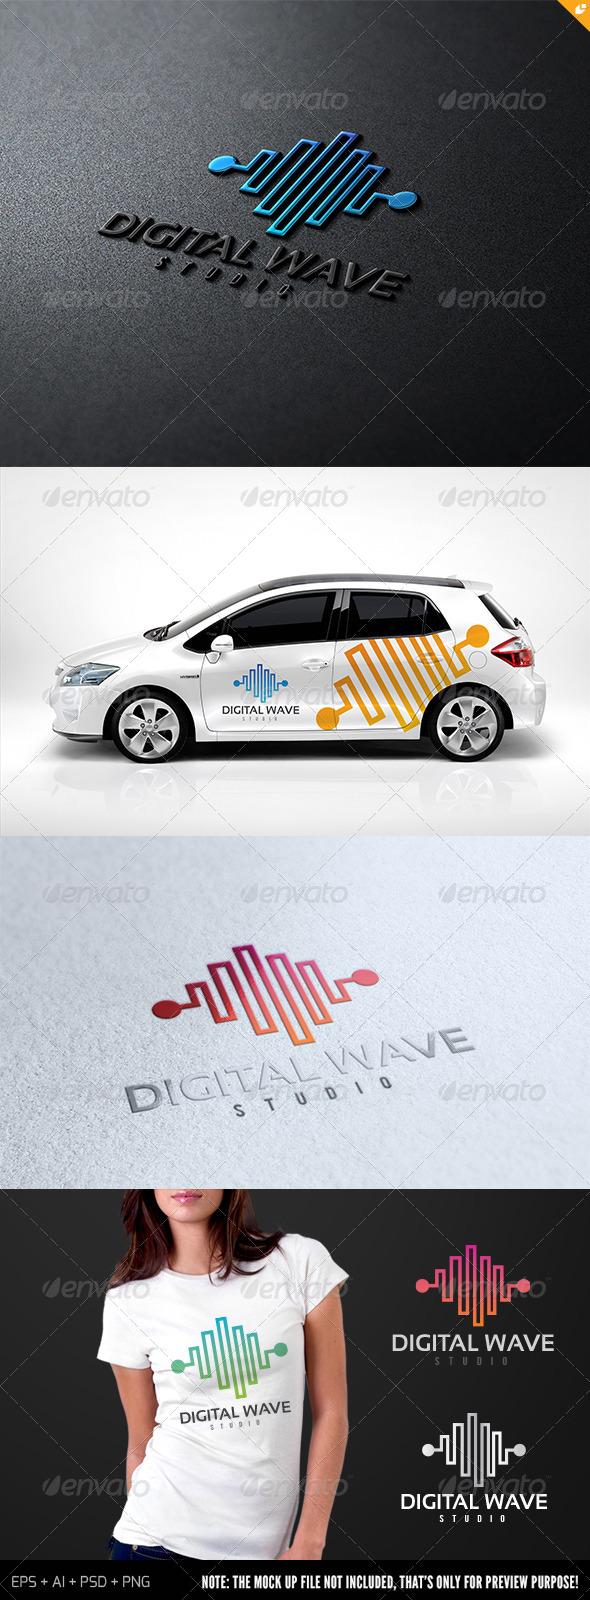 Digital Wave Studio Logo